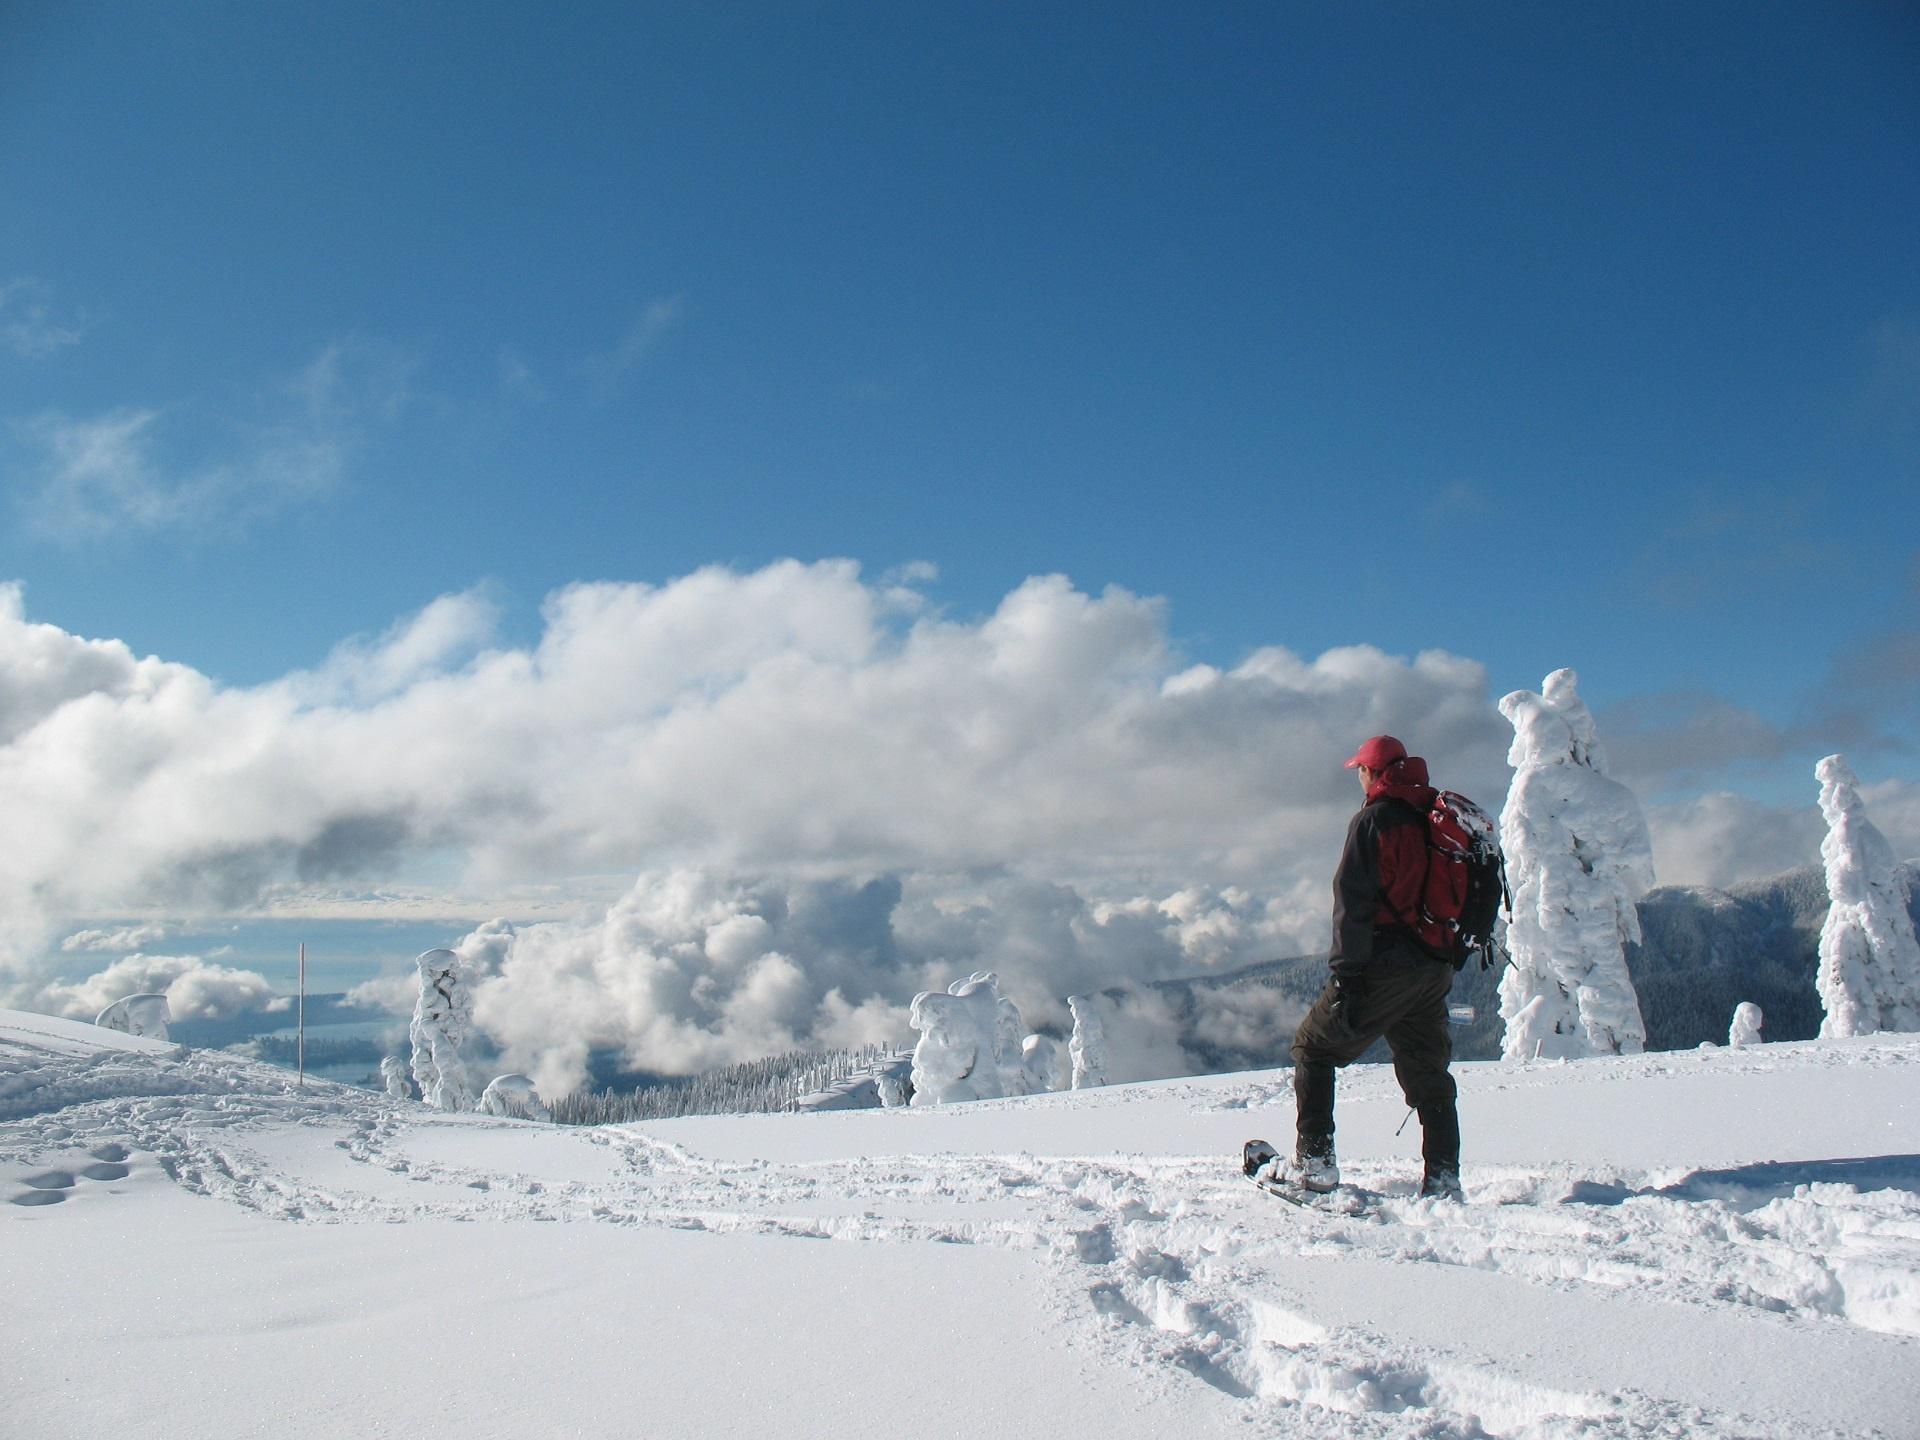 Winter-landscape-with-hiker-WEB.jpg